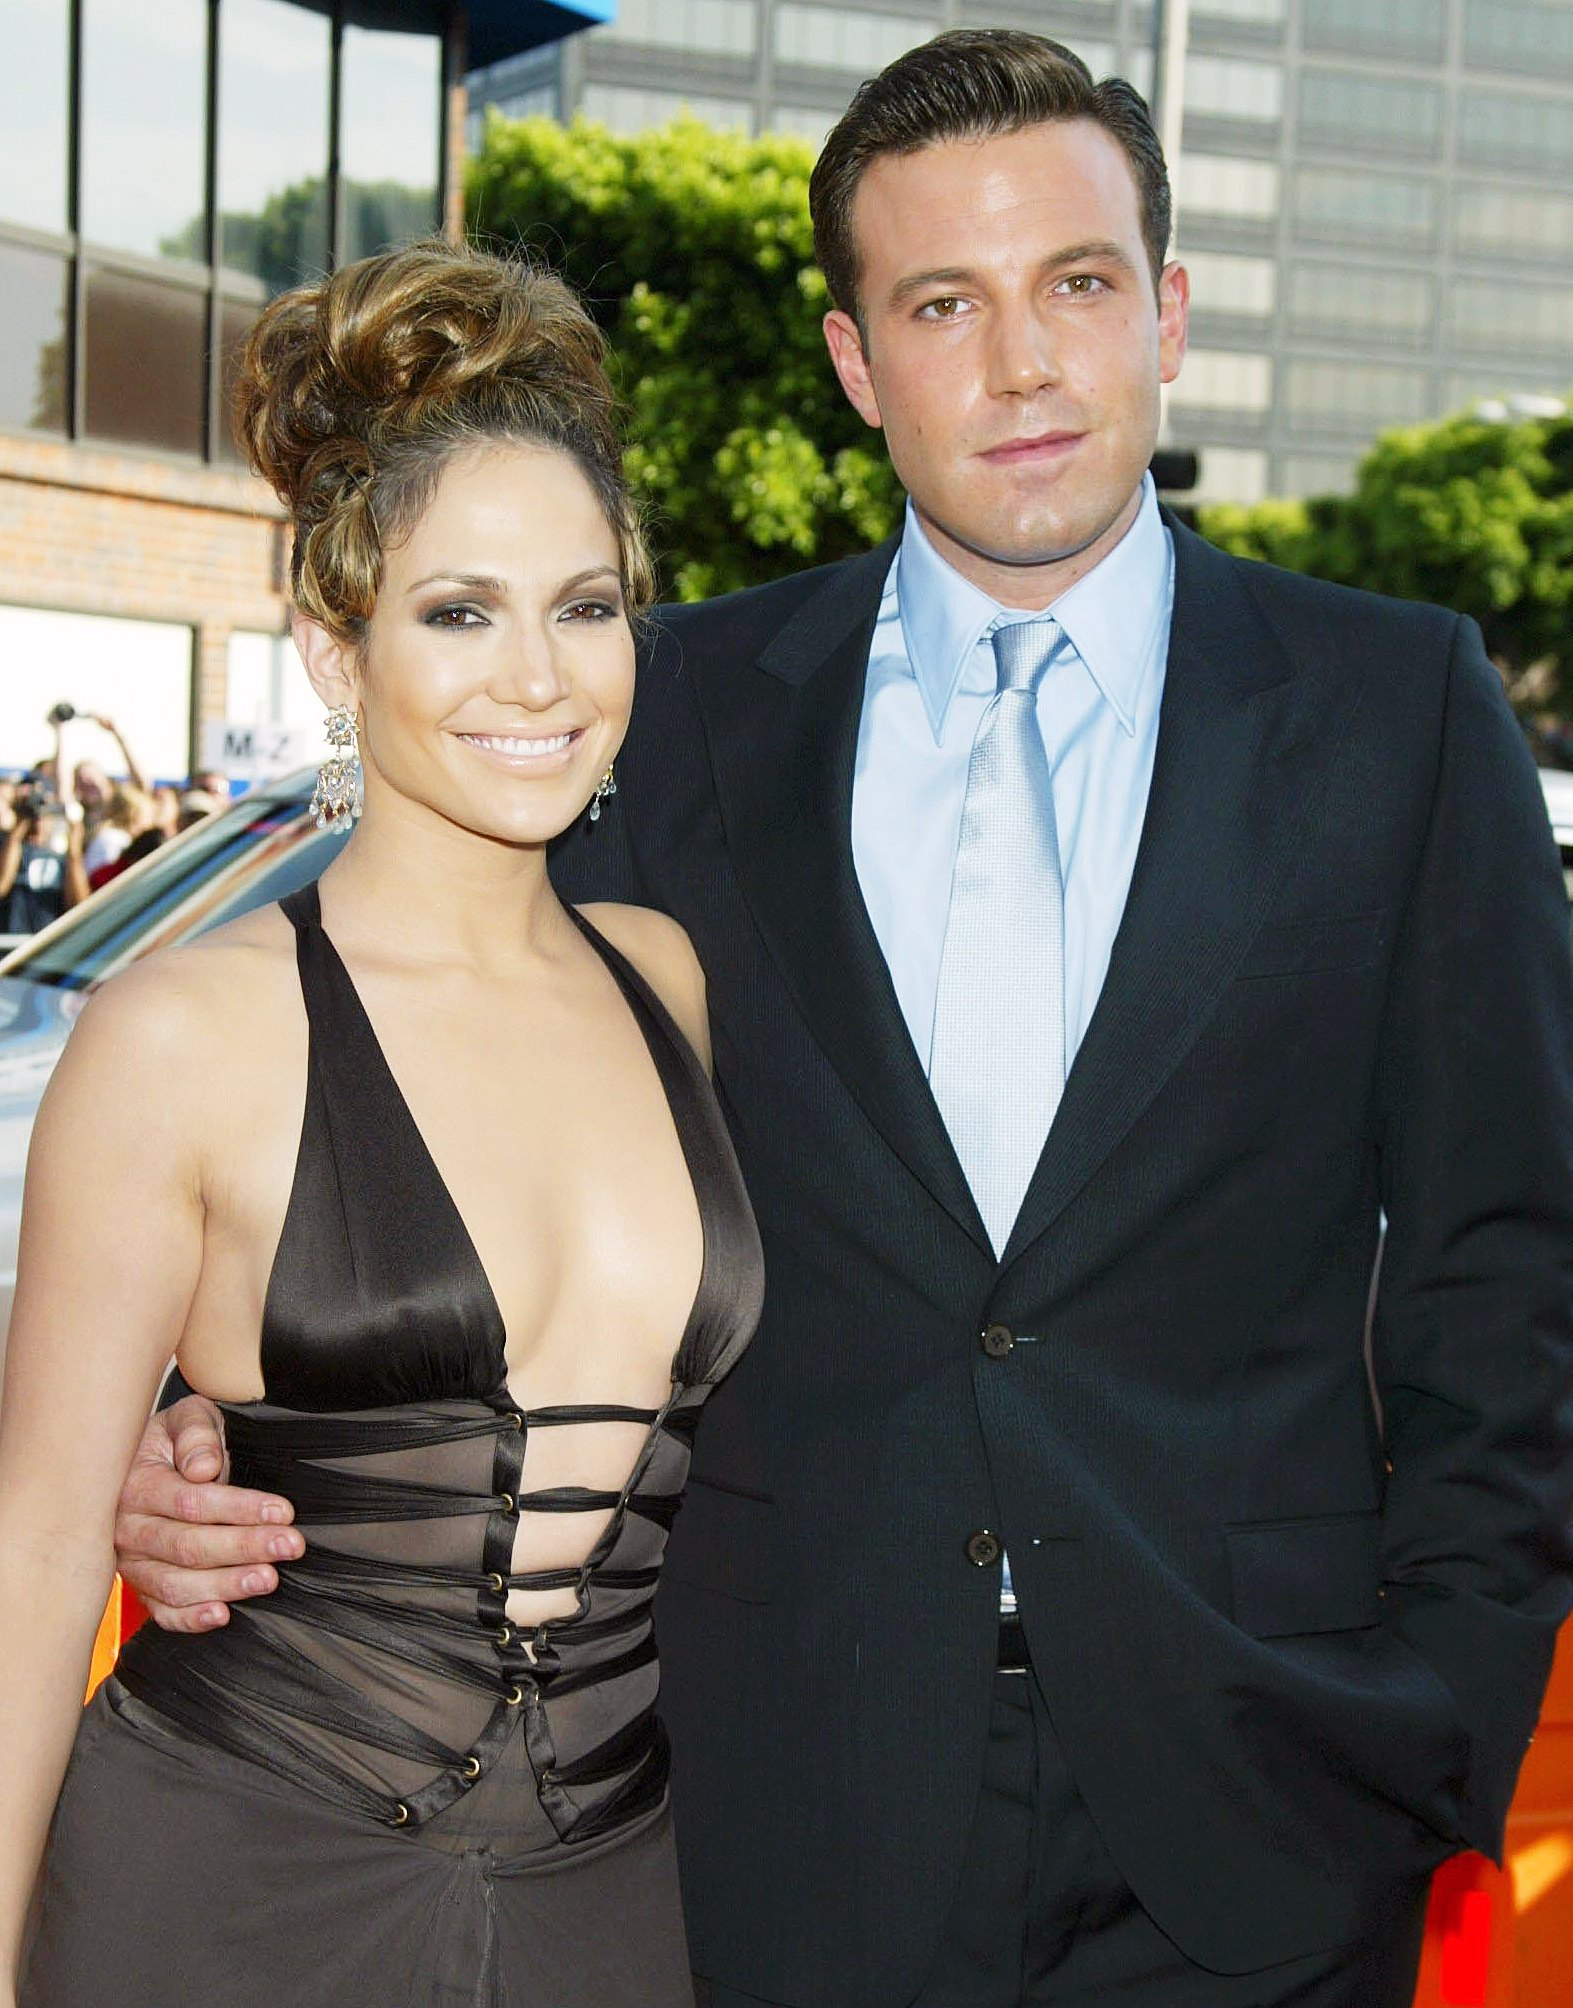 Ben Affleck flirts with his ex-fiancée Jennifer Lopez ... know what he said?